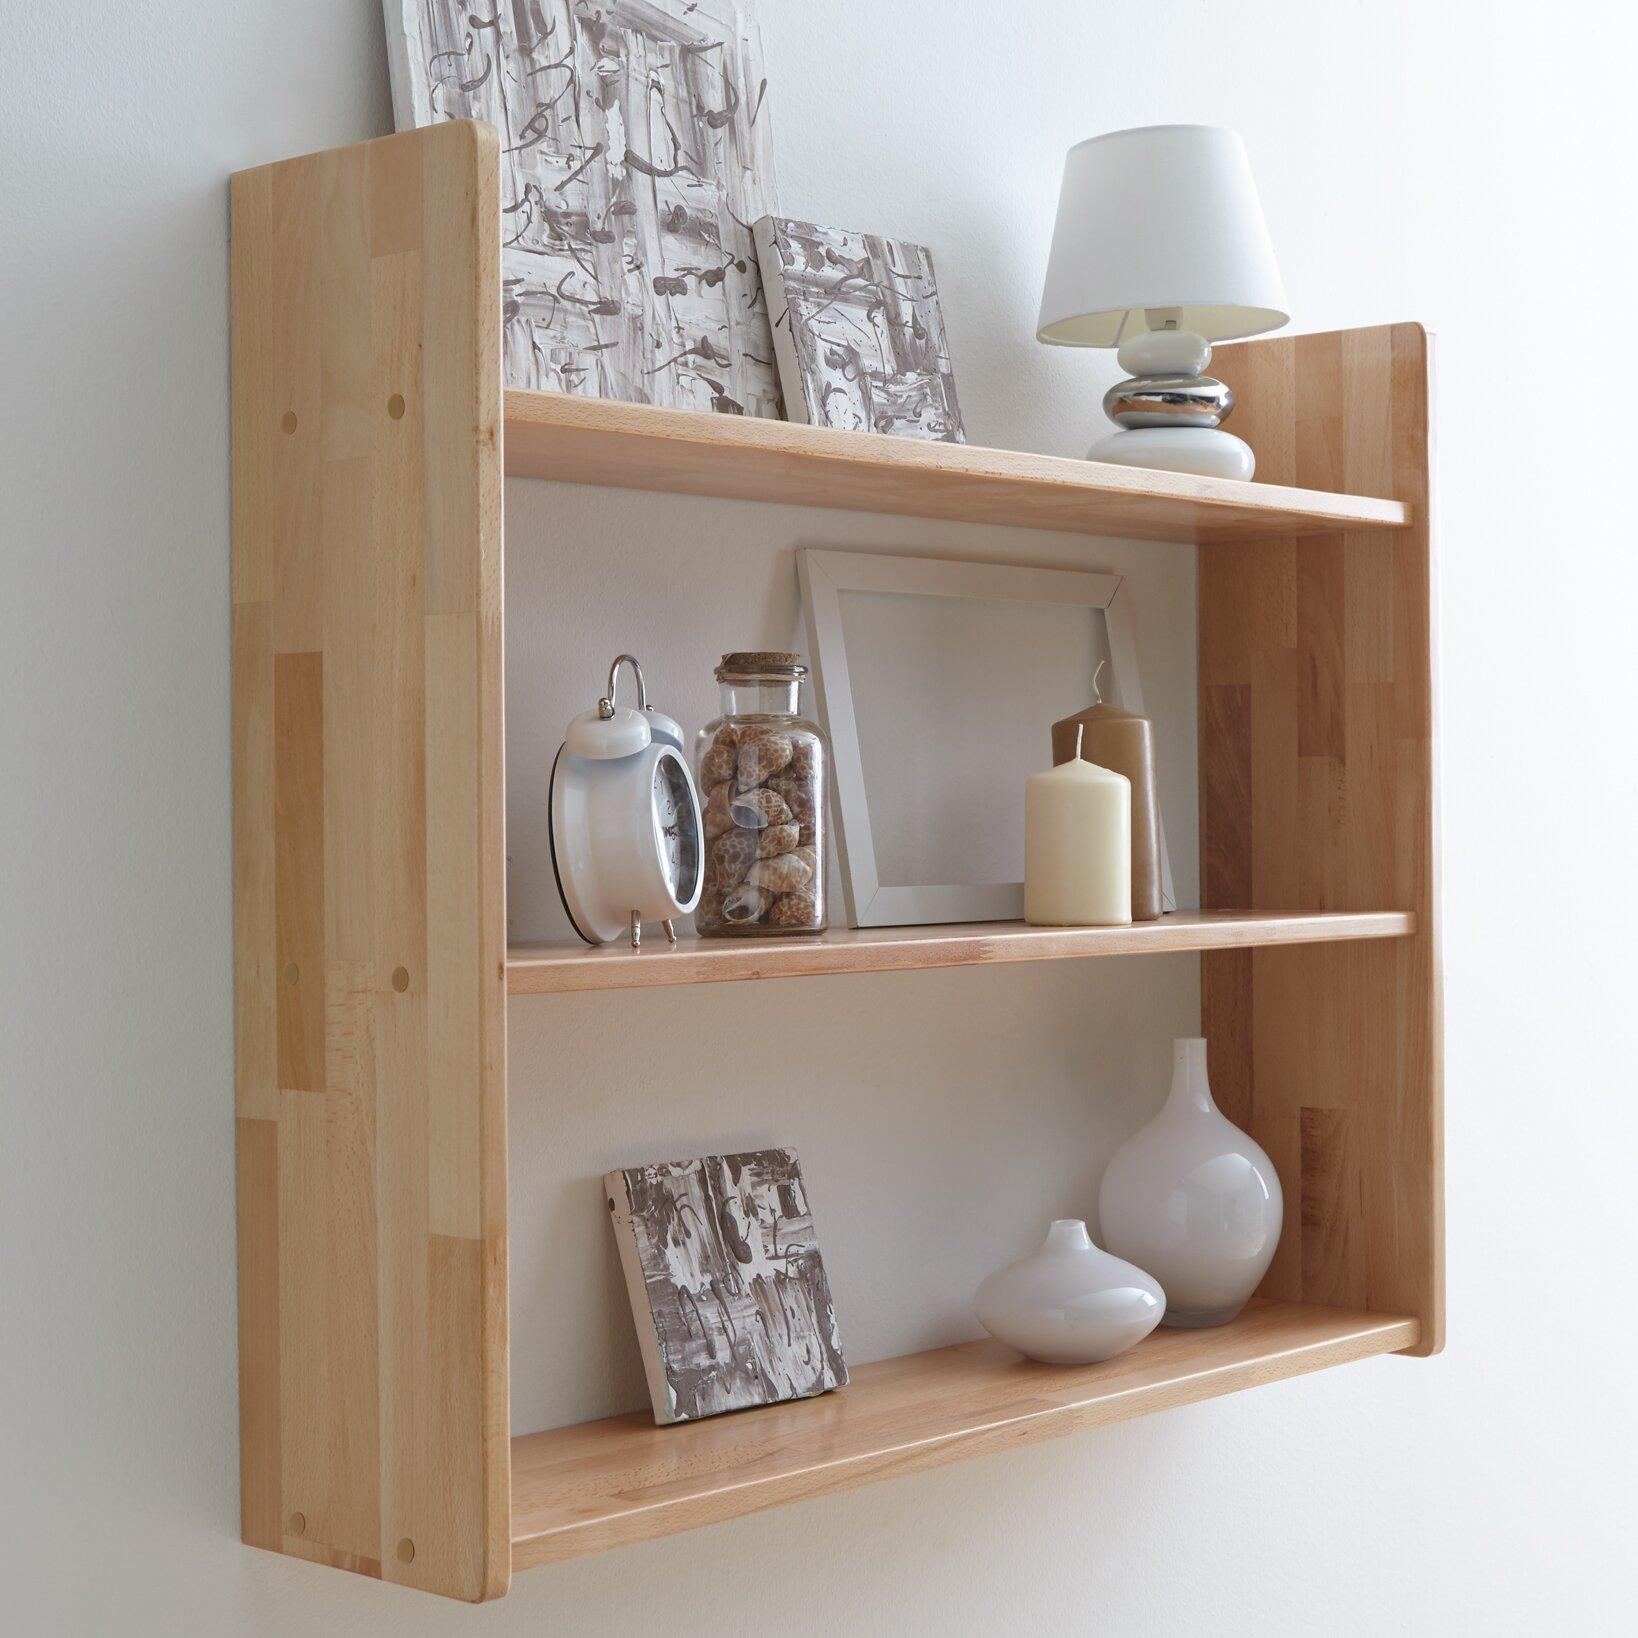 wandregal von home haus. Black Bedroom Furniture Sets. Home Design Ideas